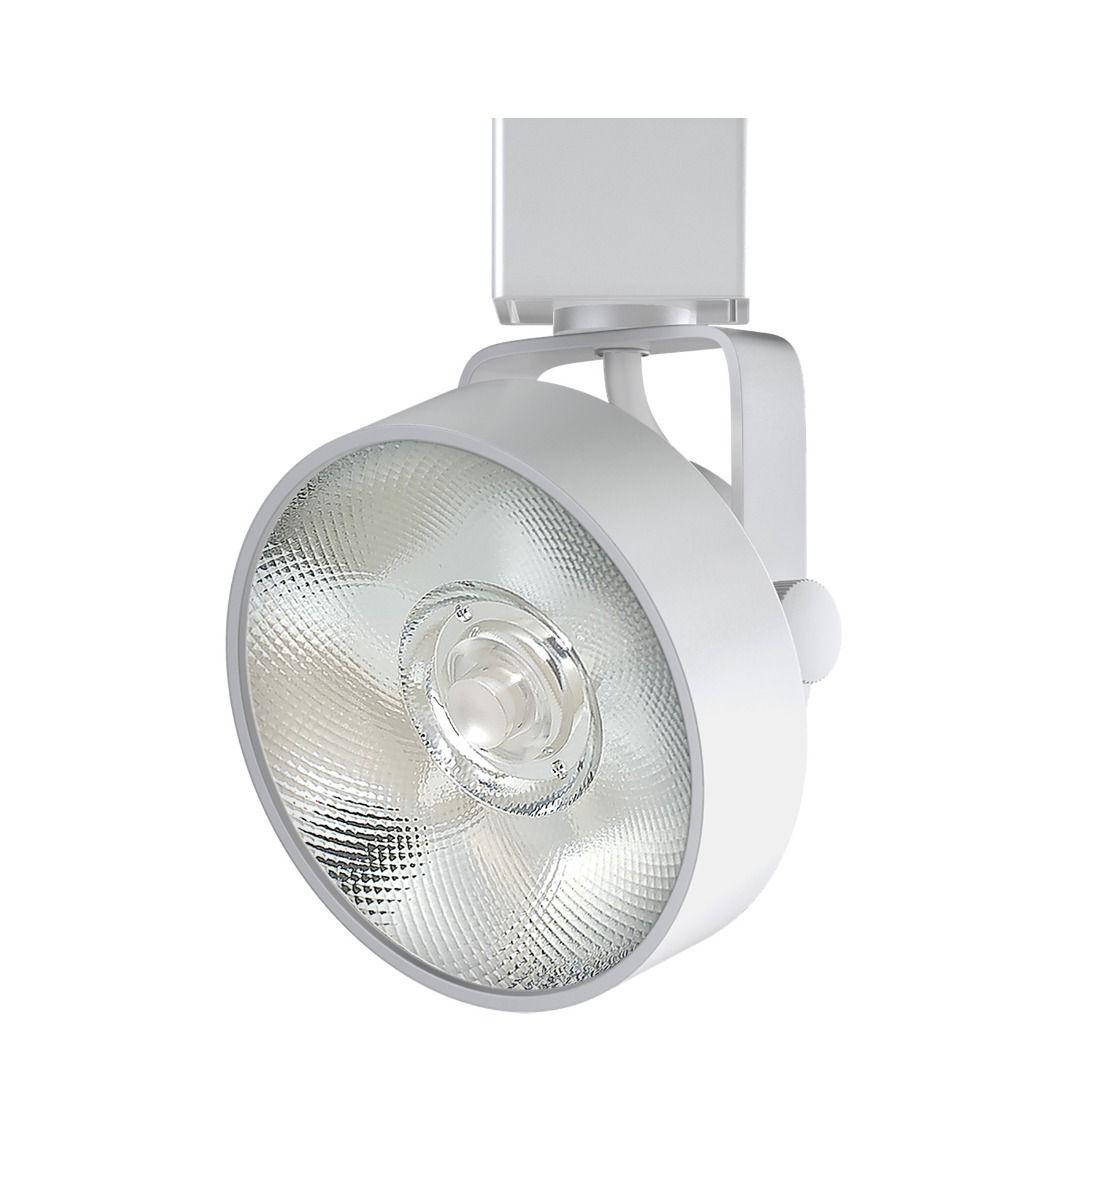 Alcon lighting 13102 megan architectural led track lighting spot light wall wash fixture